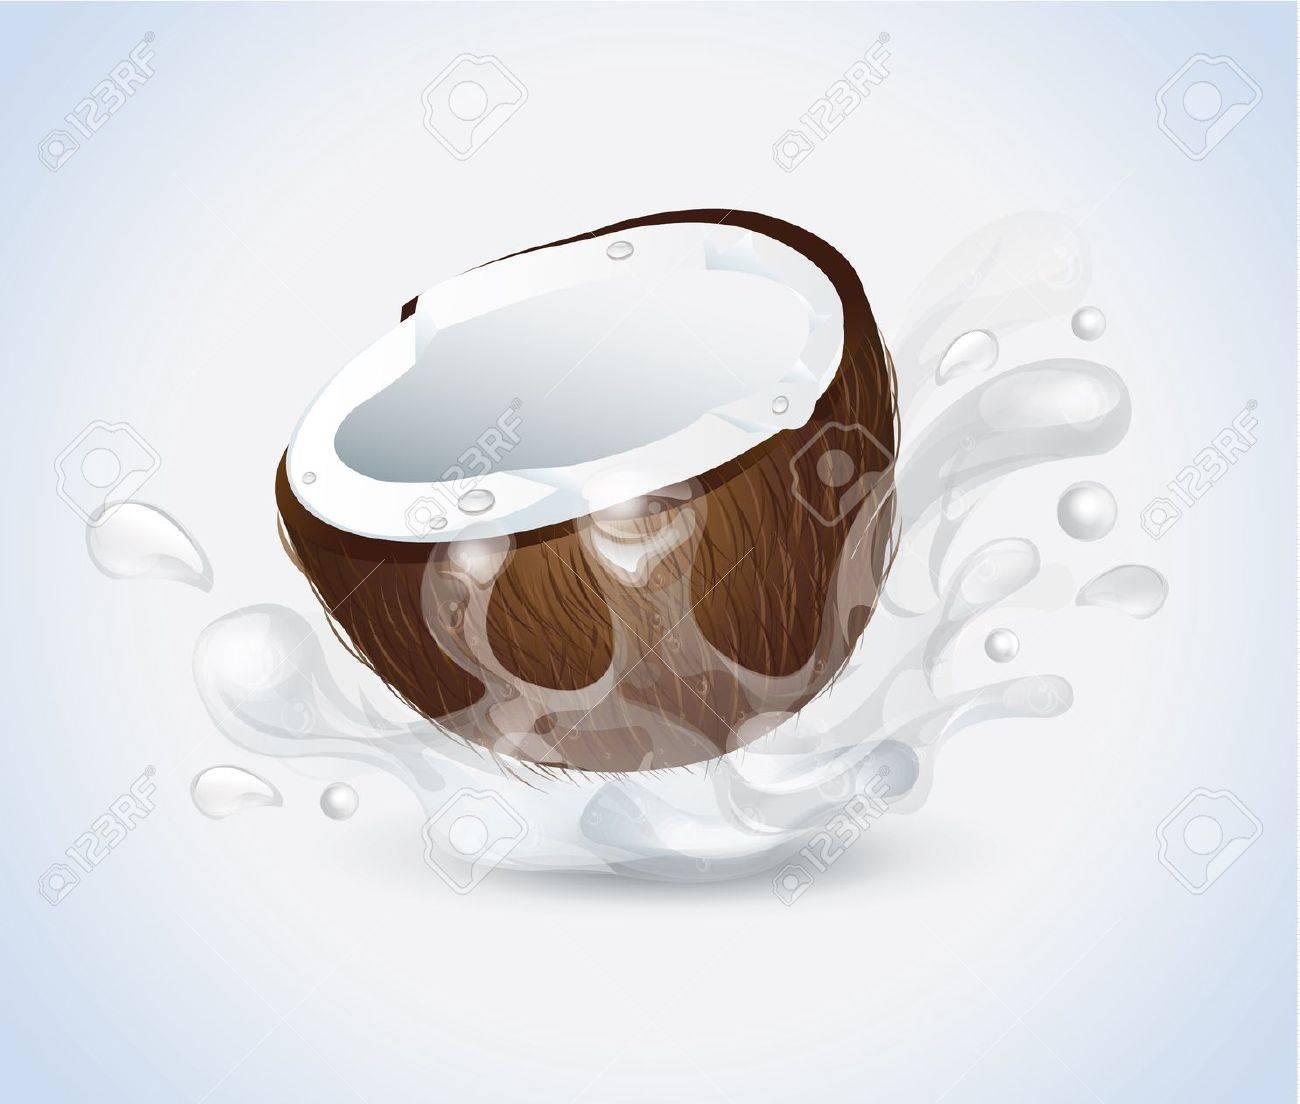 Coconut Splash Stock Vector - 21075510